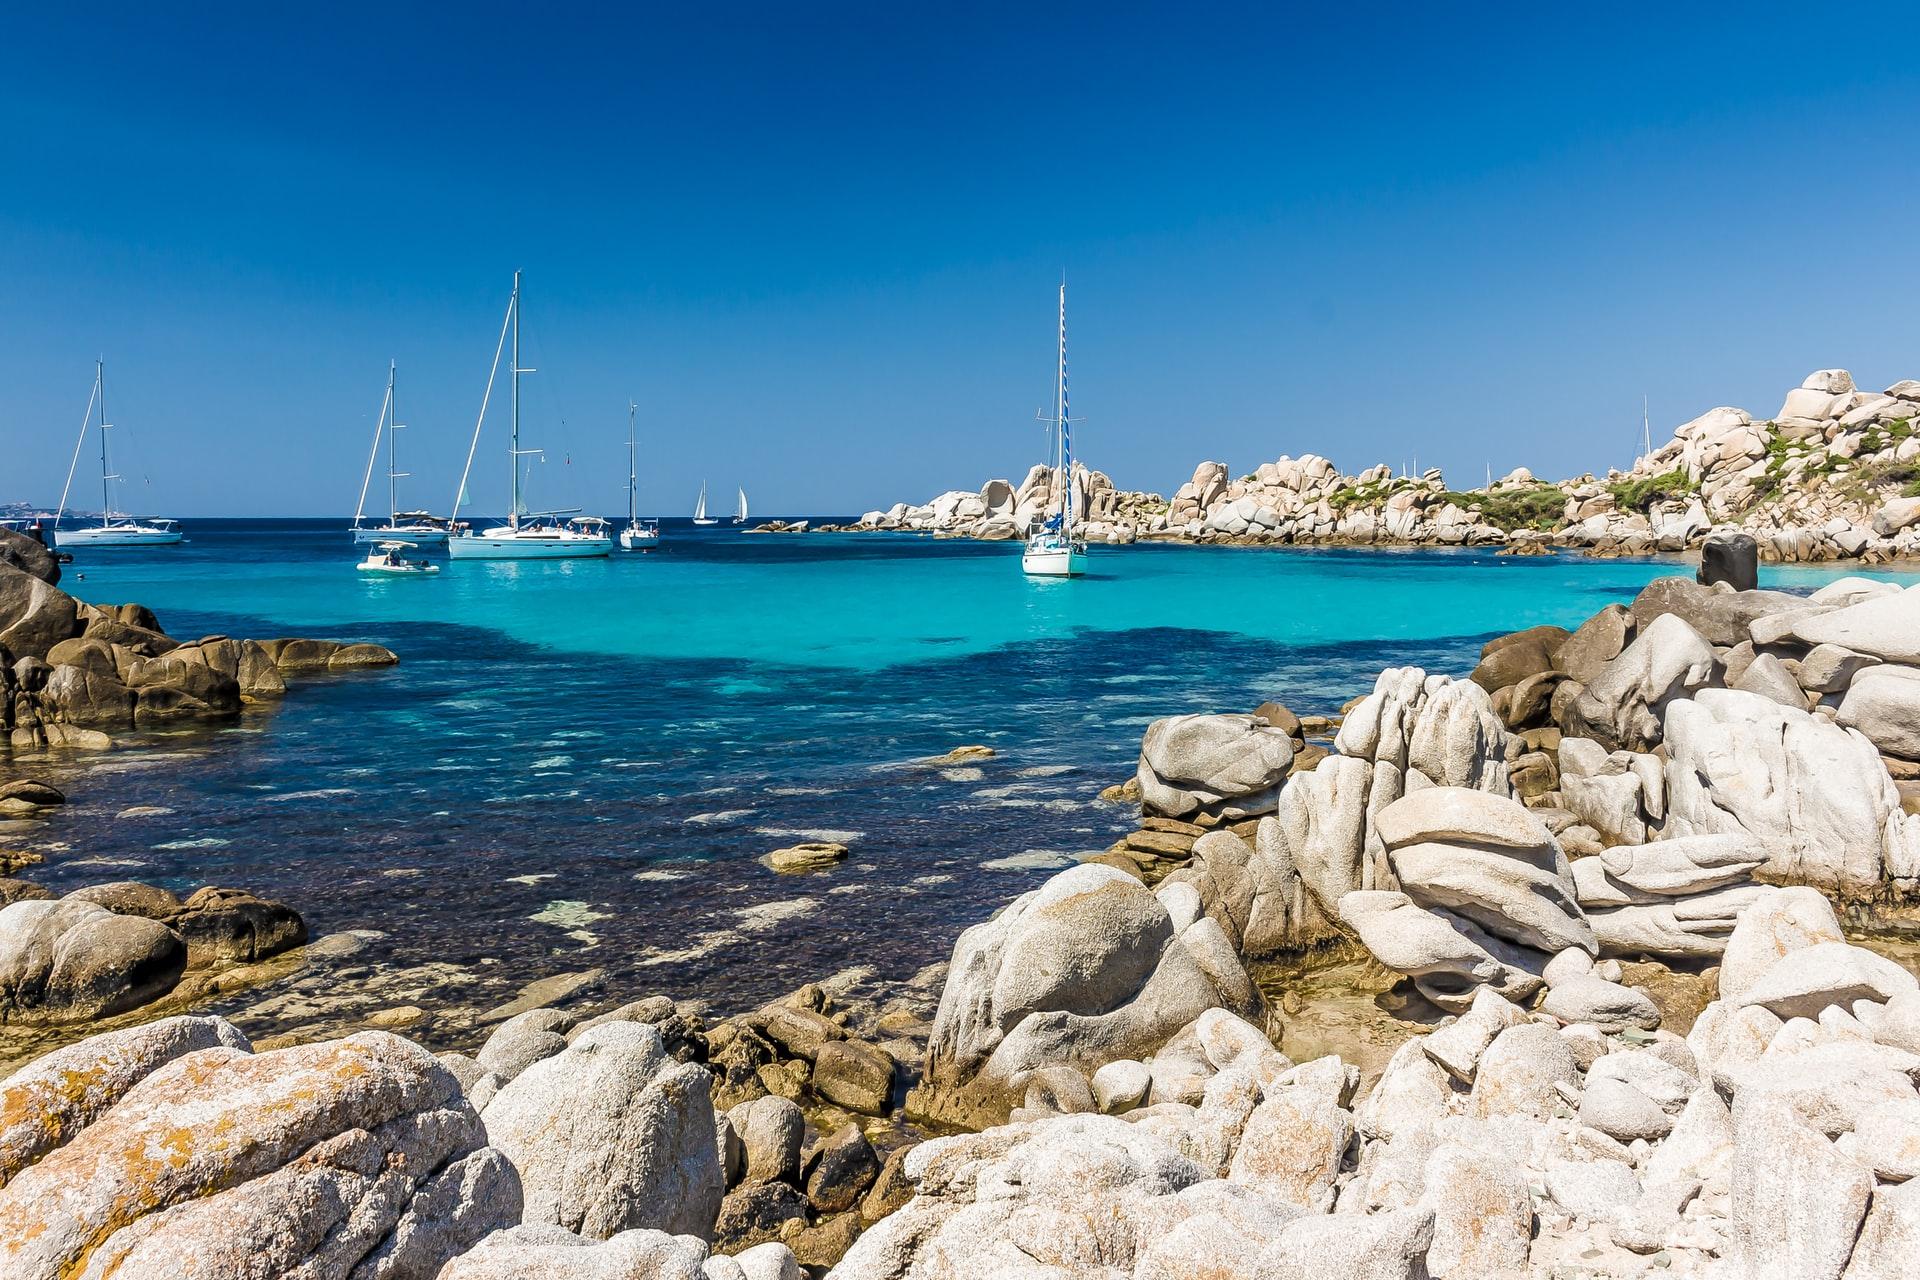 The stunning Mediterranean islands The Lavezzi Islands off Corsica are a sailor's delight